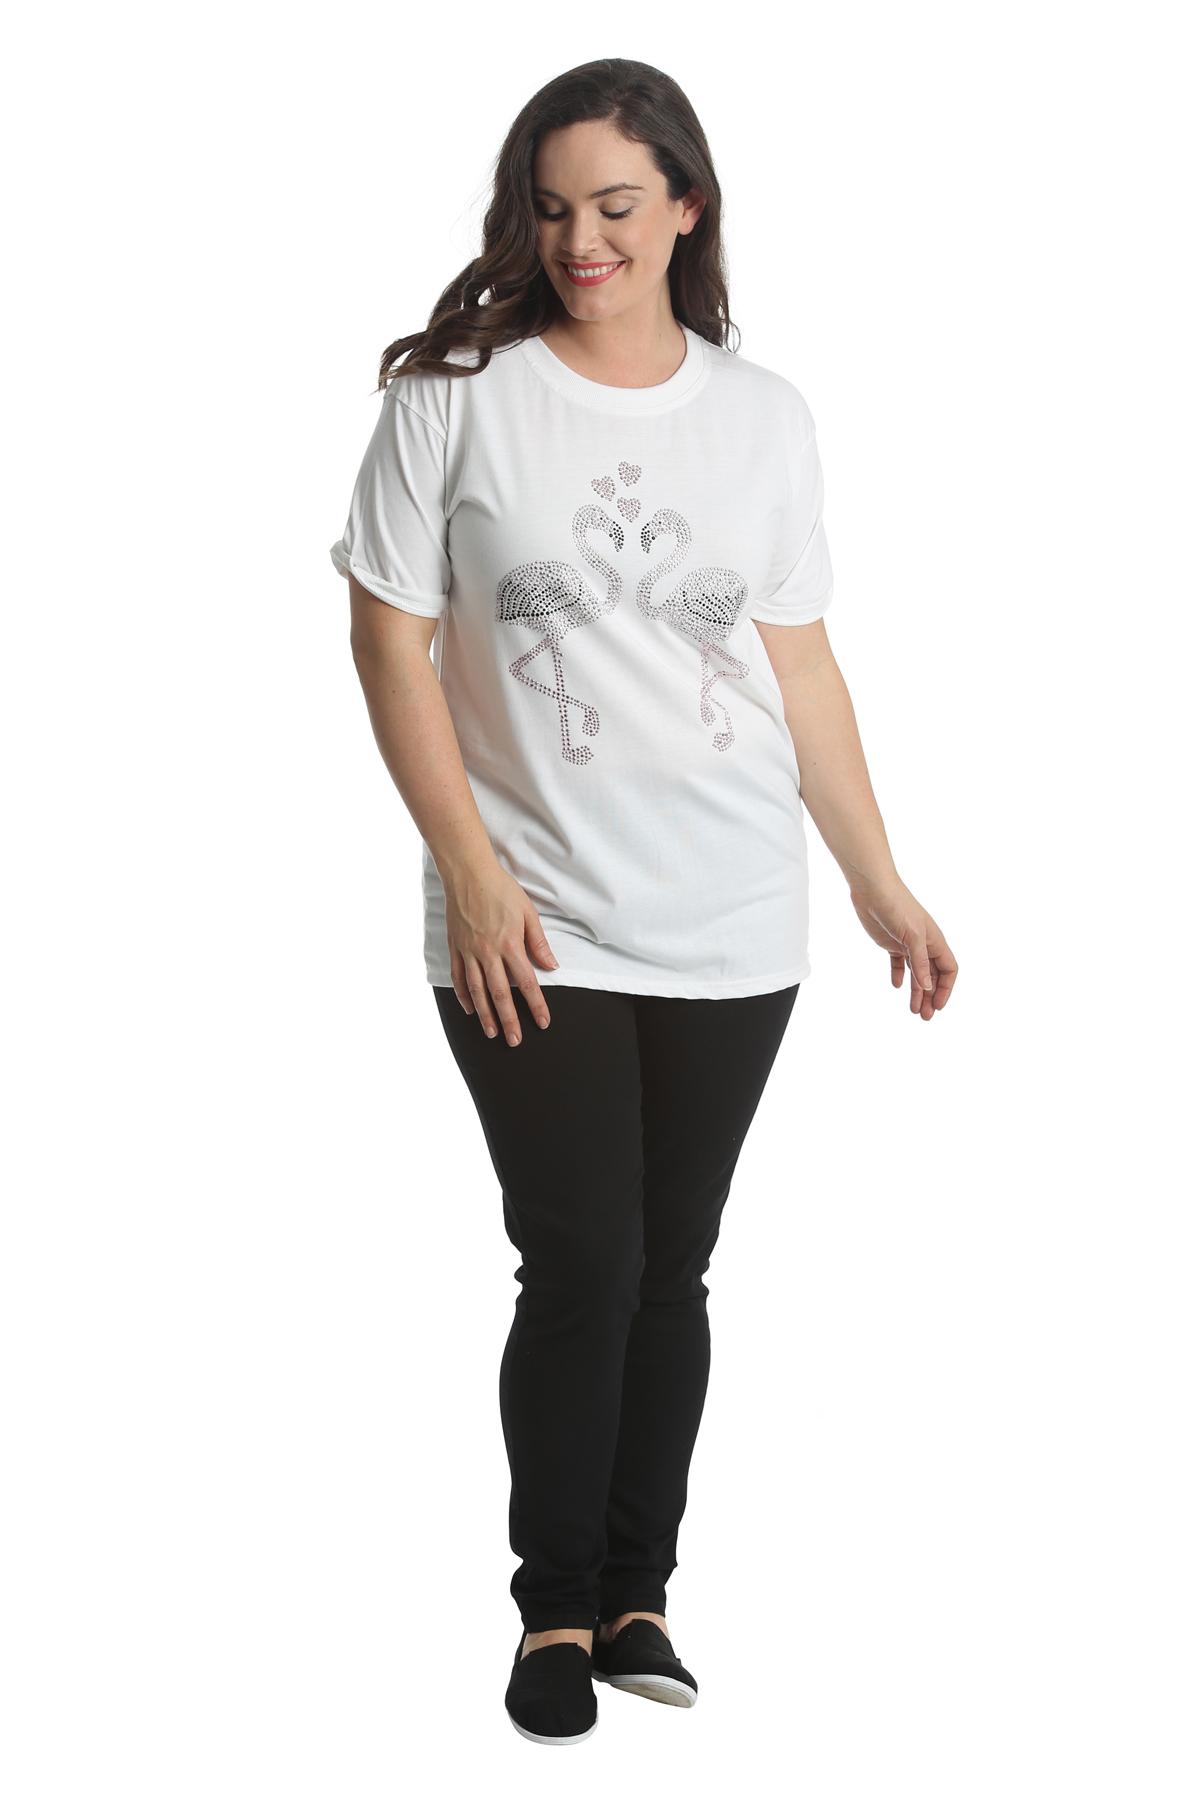 Ladies Top Womens Plus Size Shirt Flamingo Stud Rhinestone ...